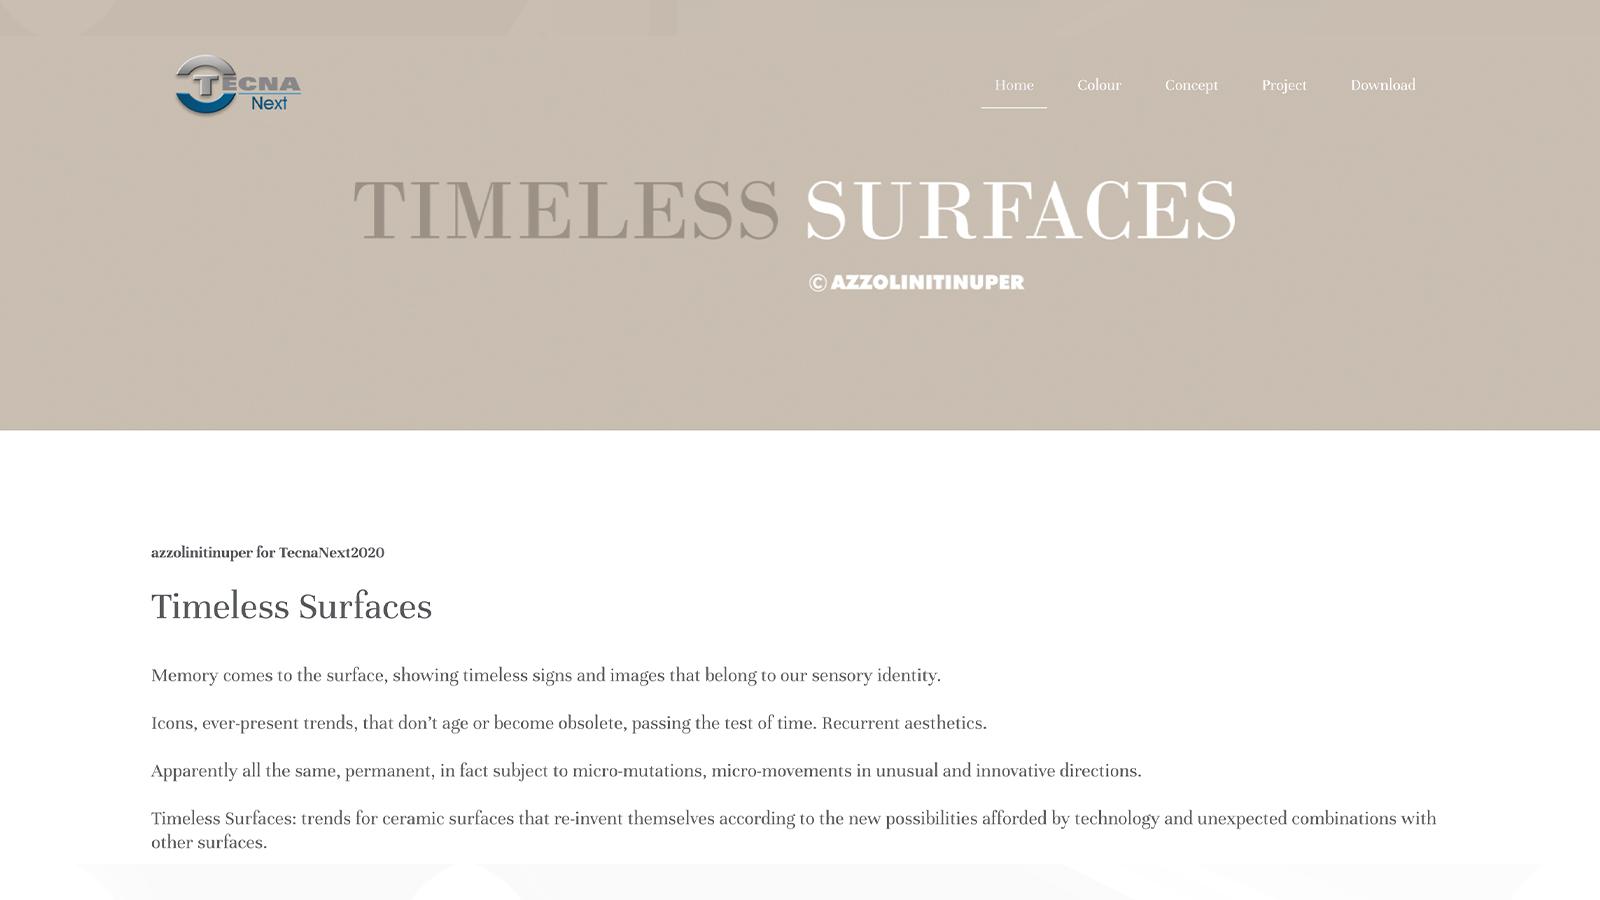 tecna-next-timeless-surfaces